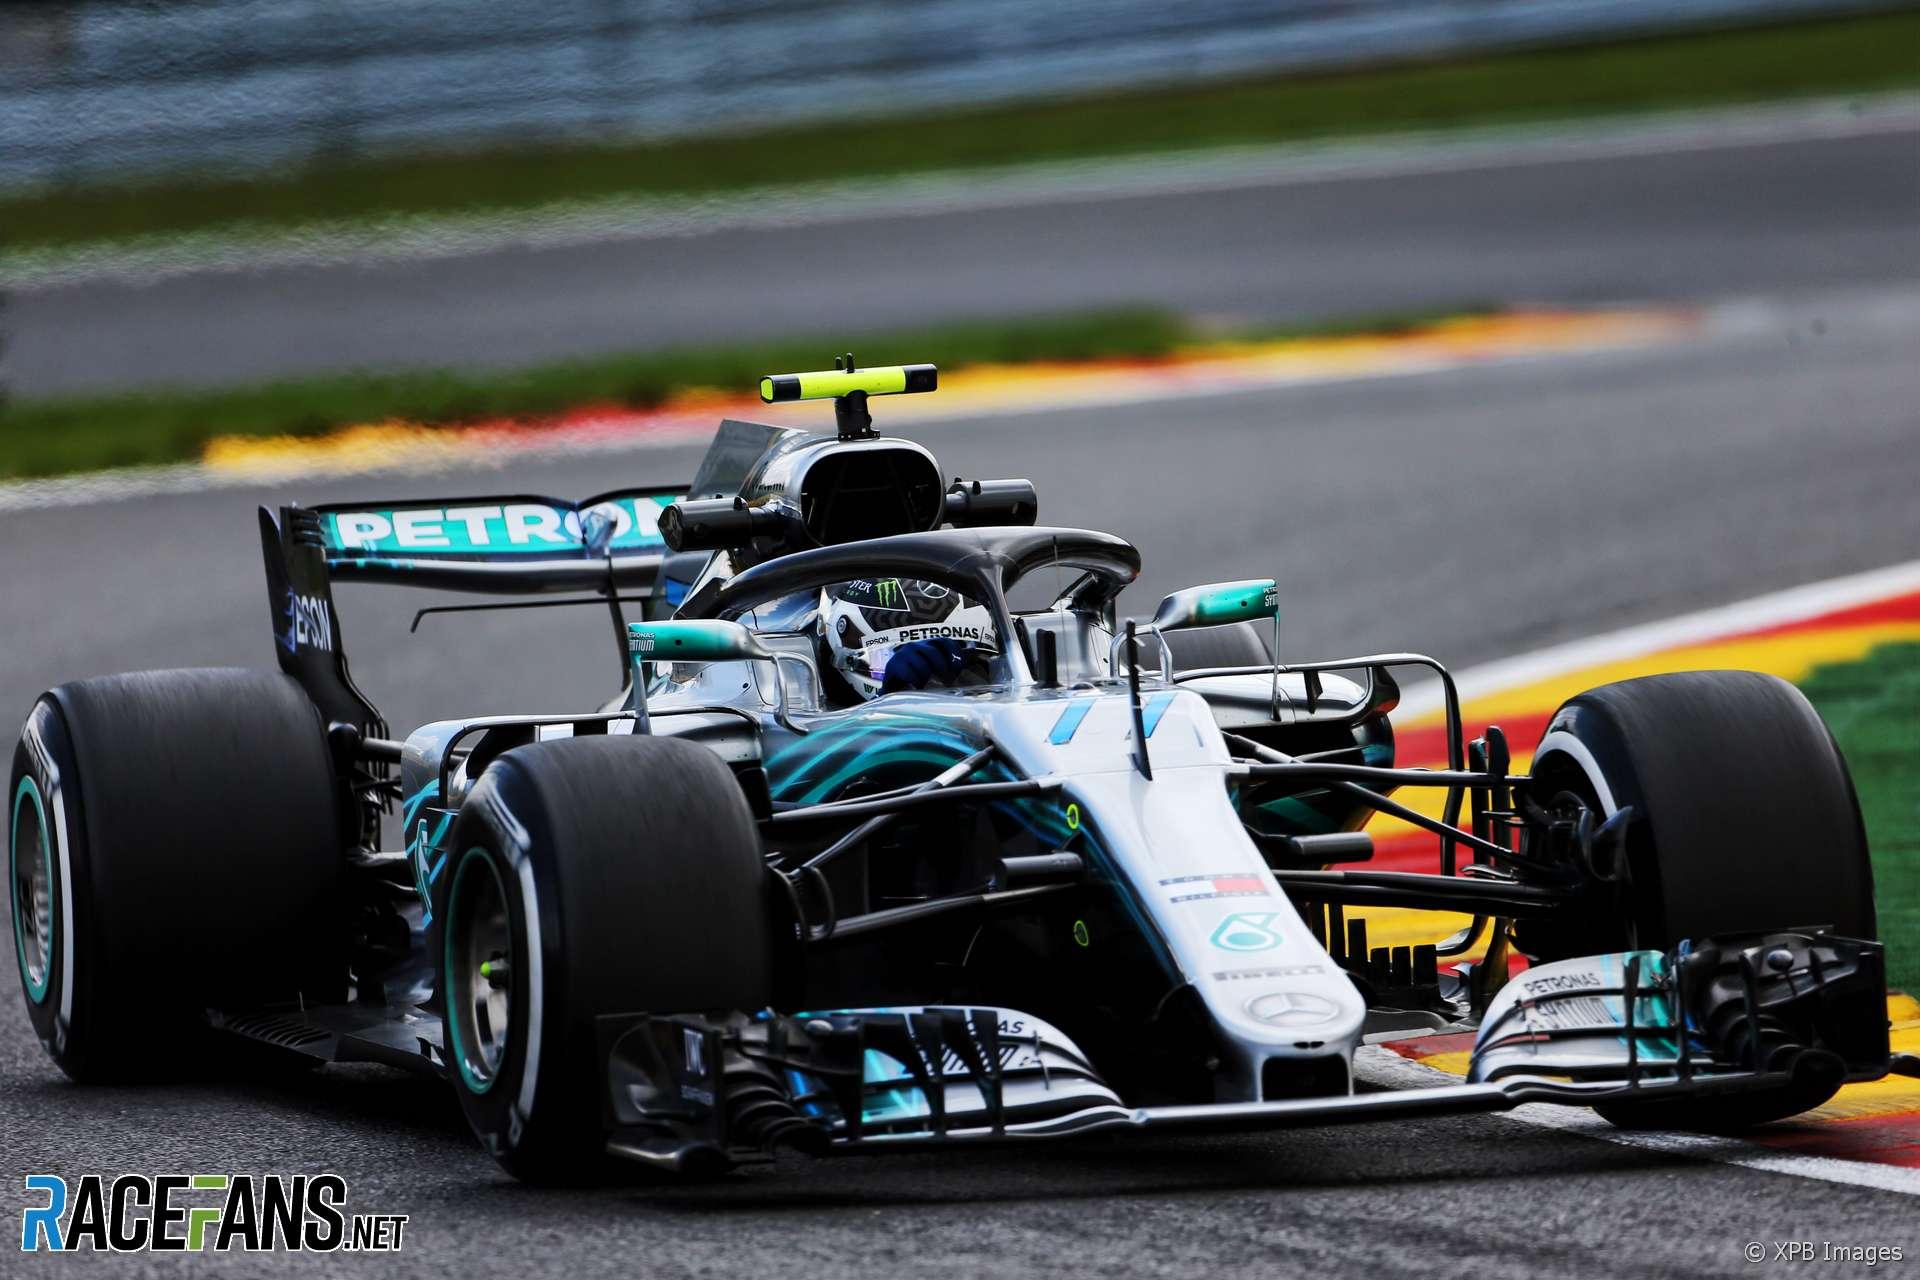 Valtteri Bottas, Mercedes, Spa-Francorchamps, 2018